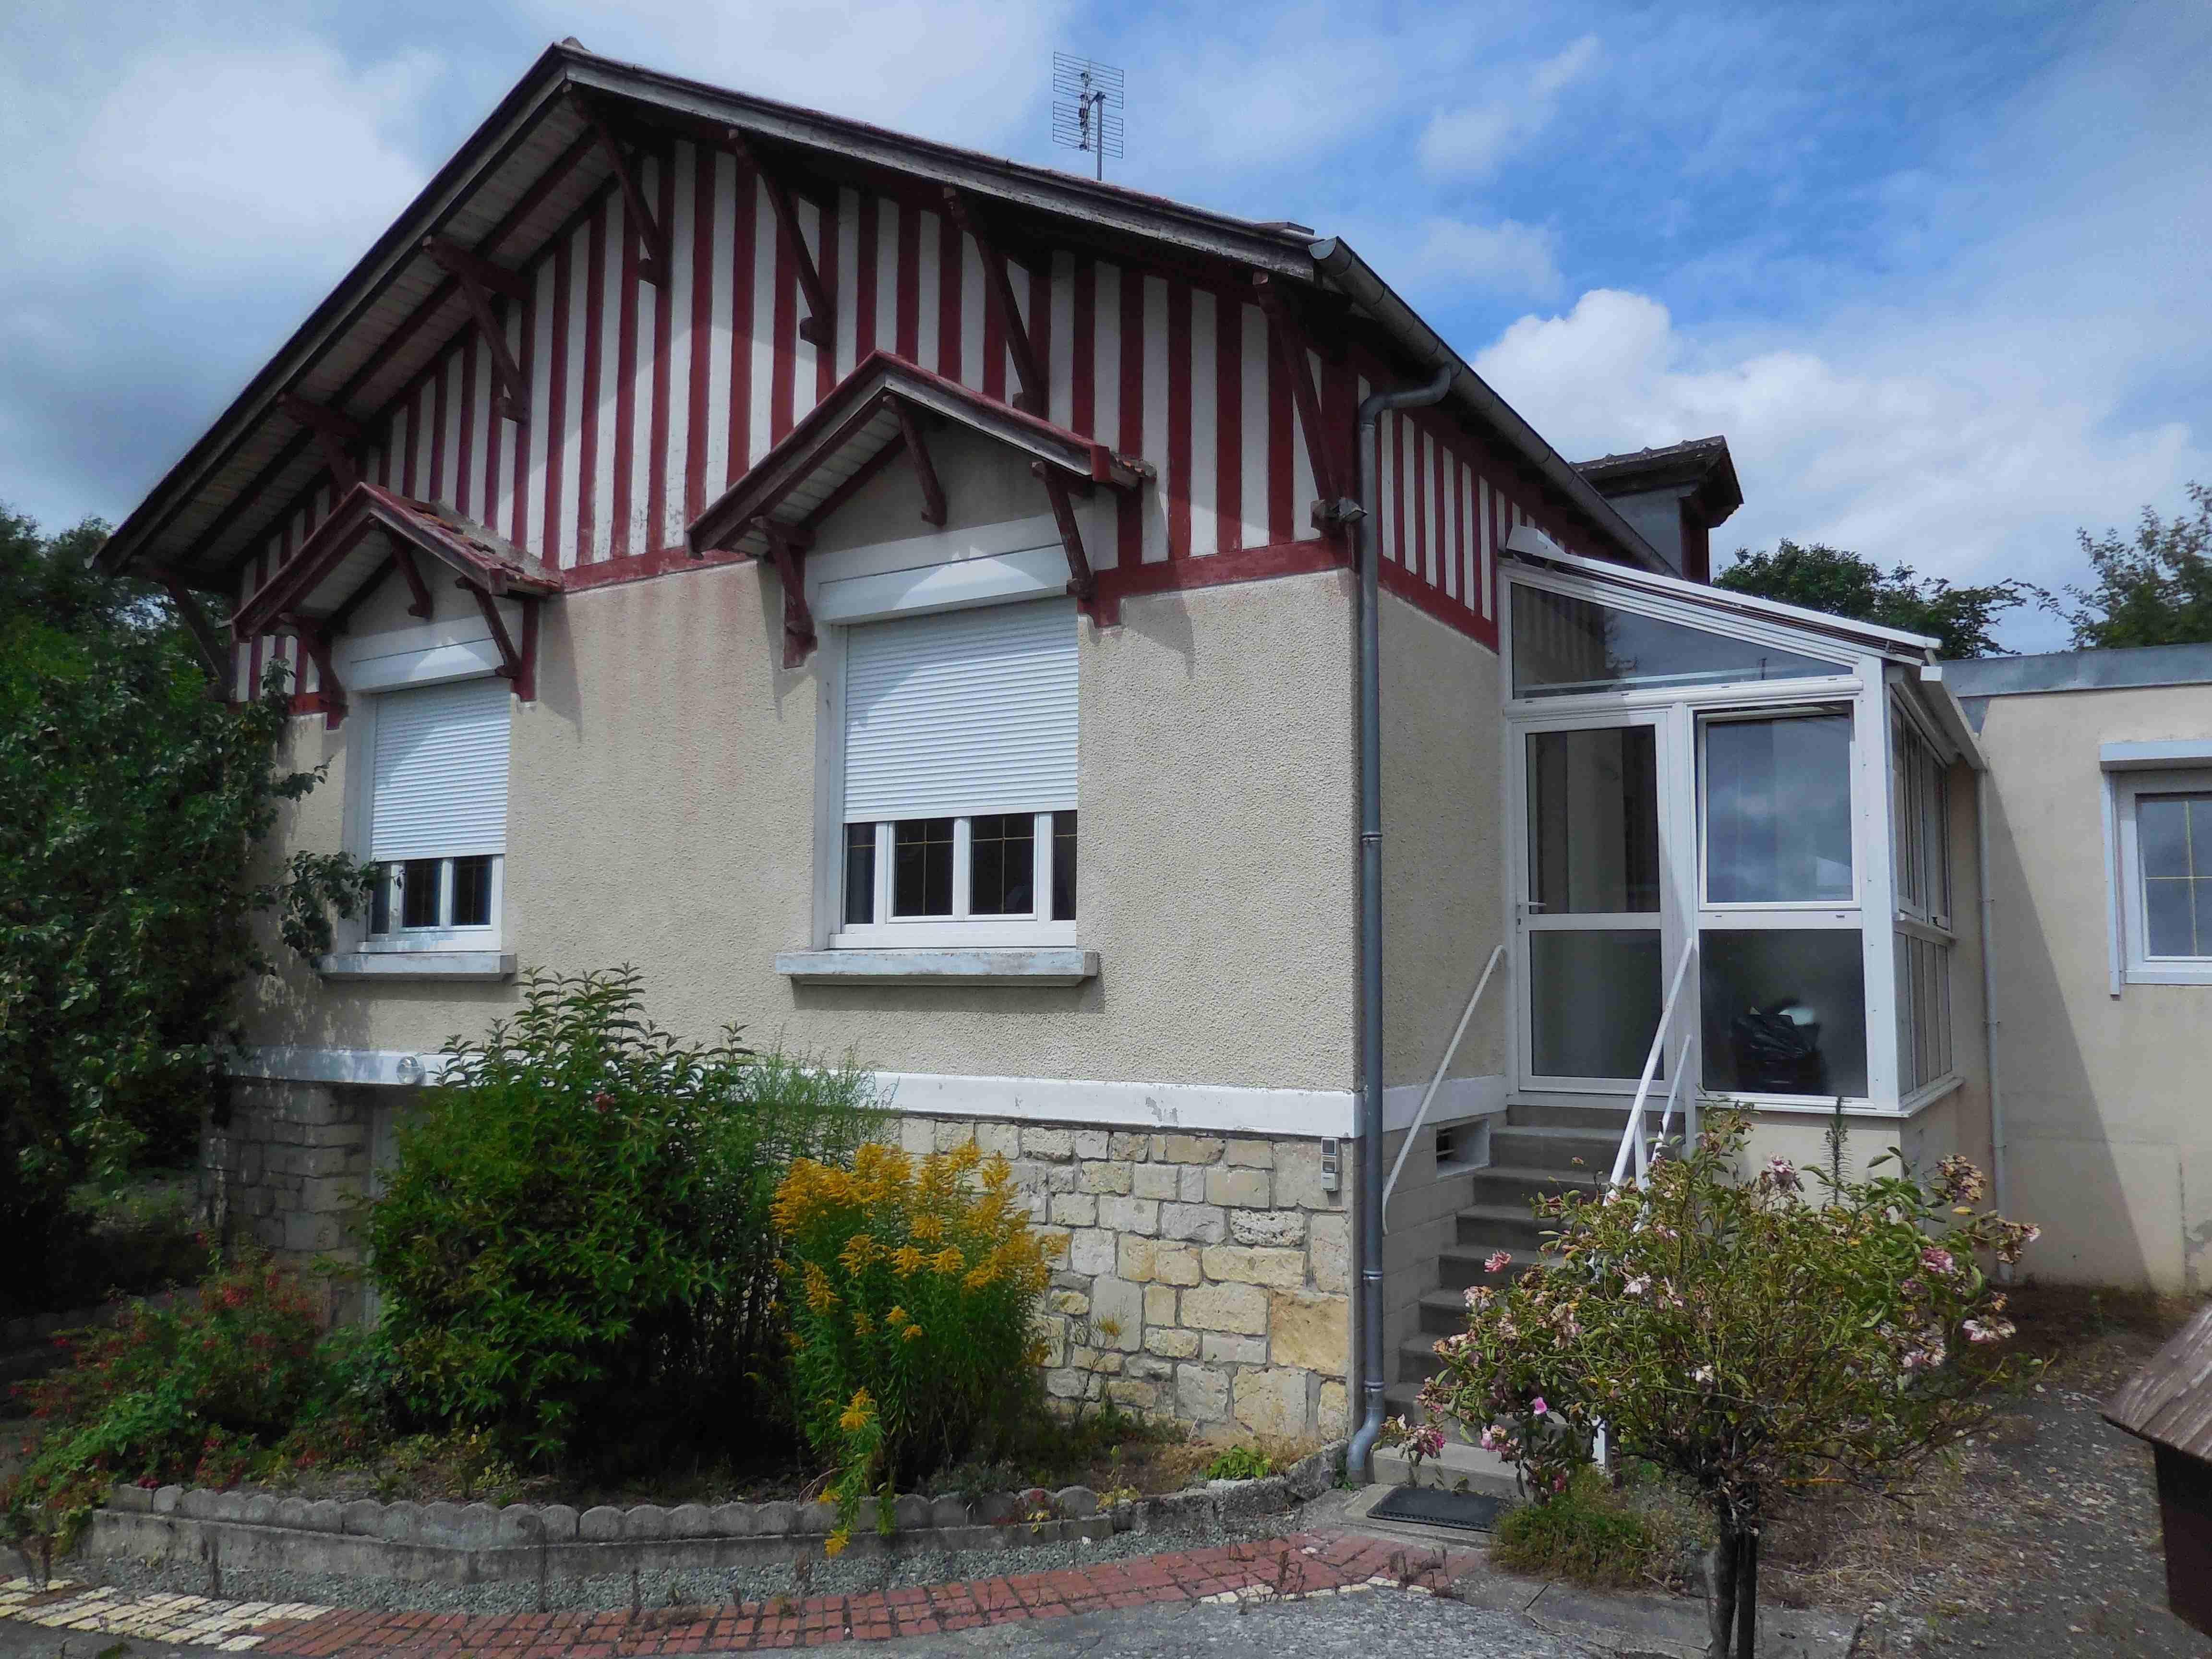 veranda entree maison free veranda entree maison with veranda entree maison free petite. Black Bedroom Furniture Sets. Home Design Ideas